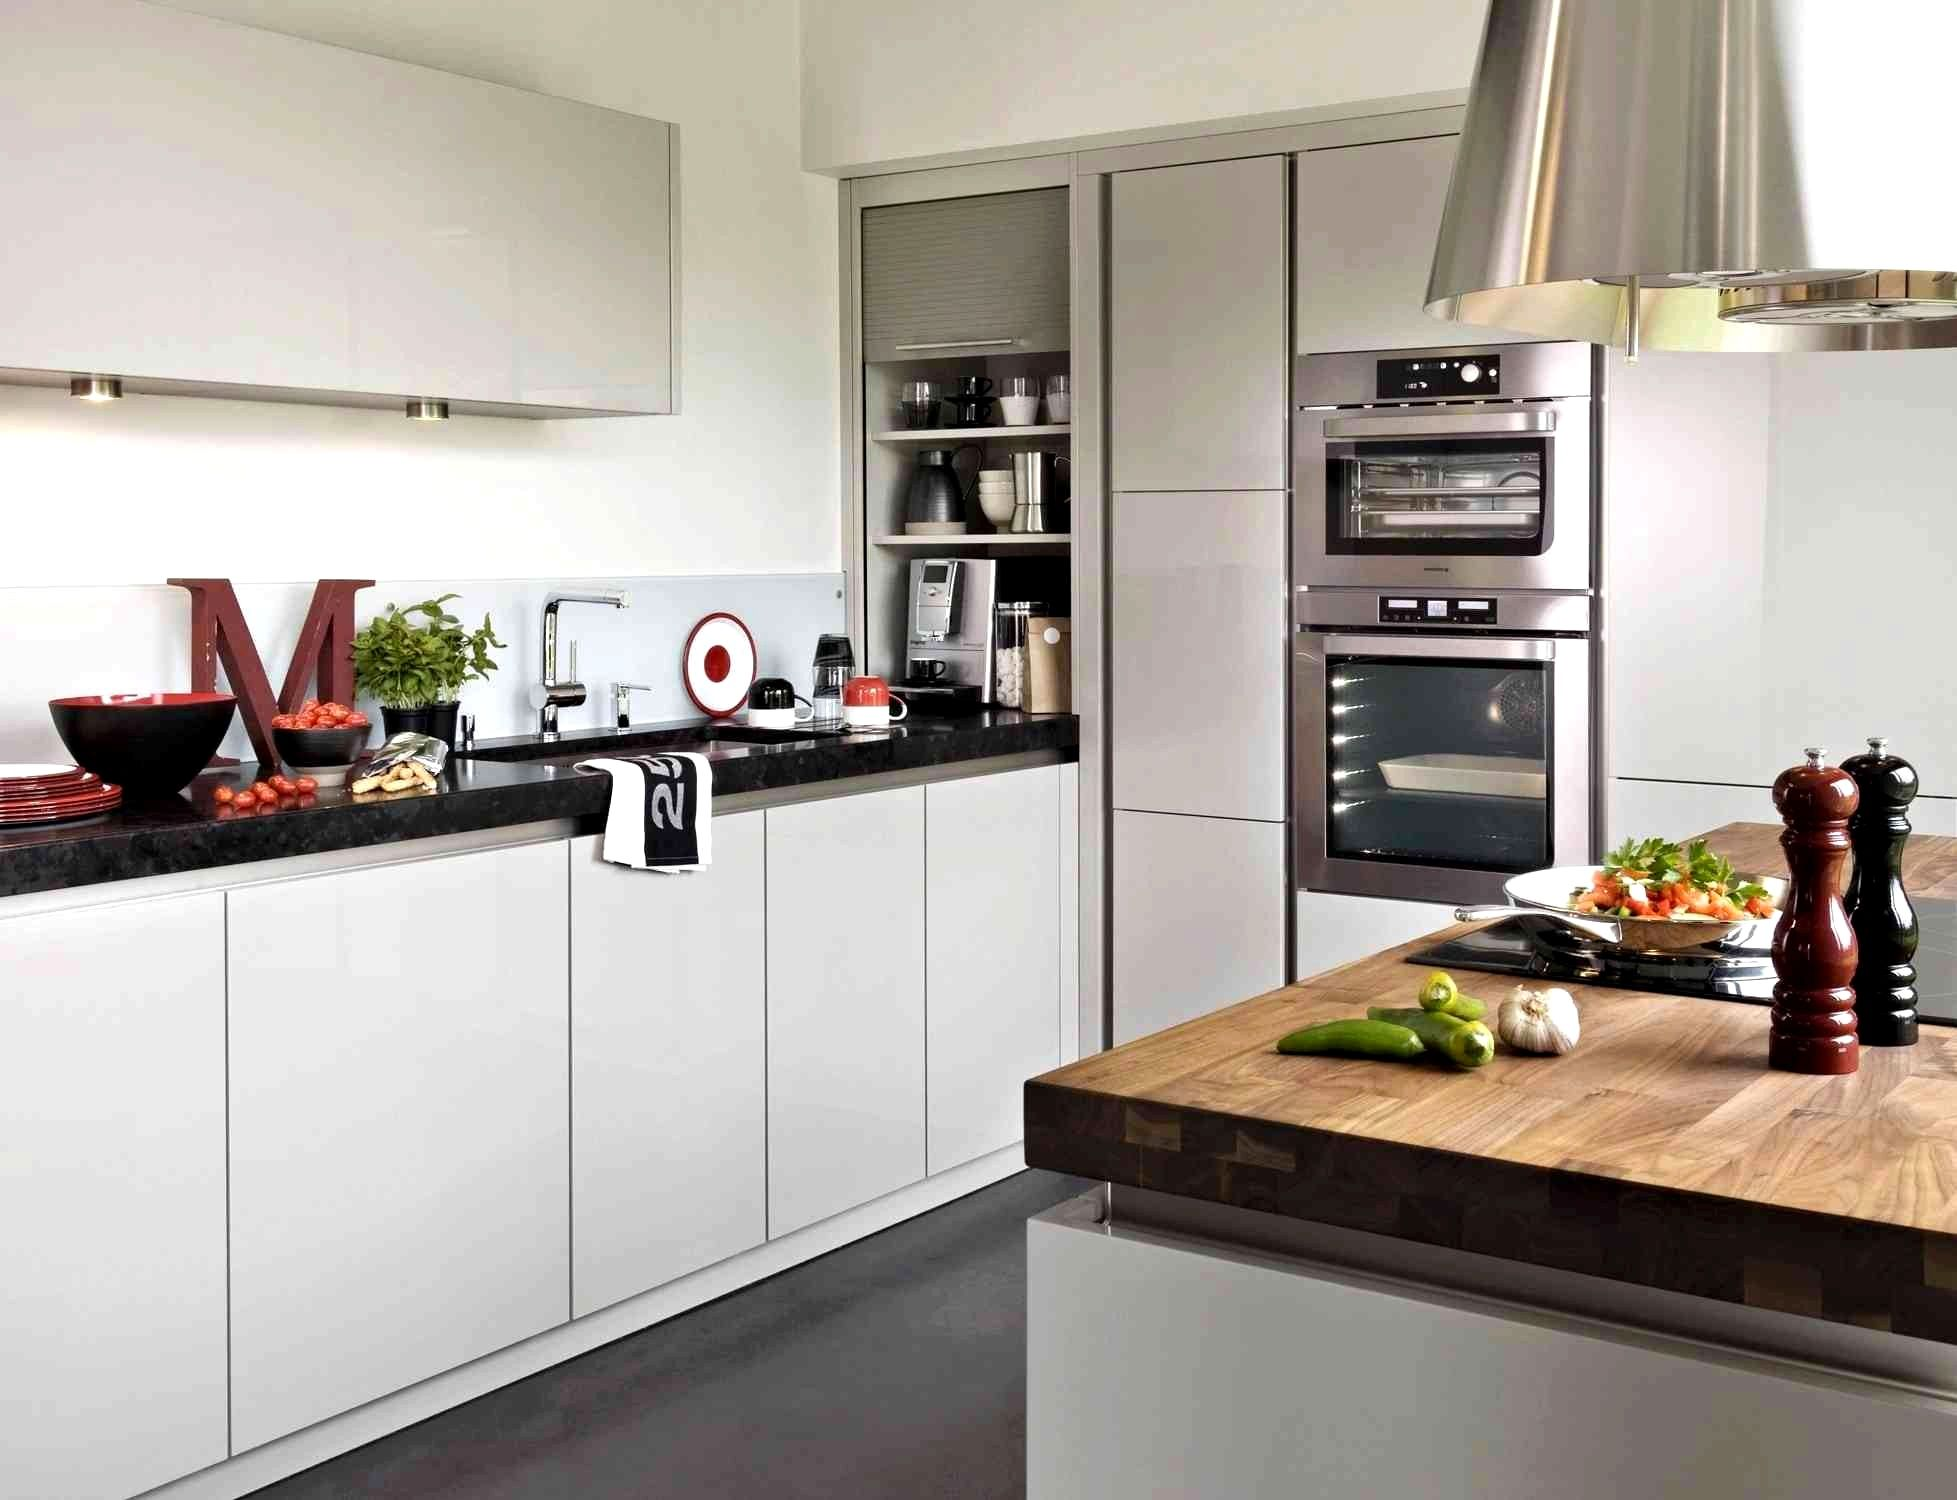 Plan De Travail Castorama Trick En 2020 Meuble Cuisine Cuisine Moderne Meuble Salle A Manger